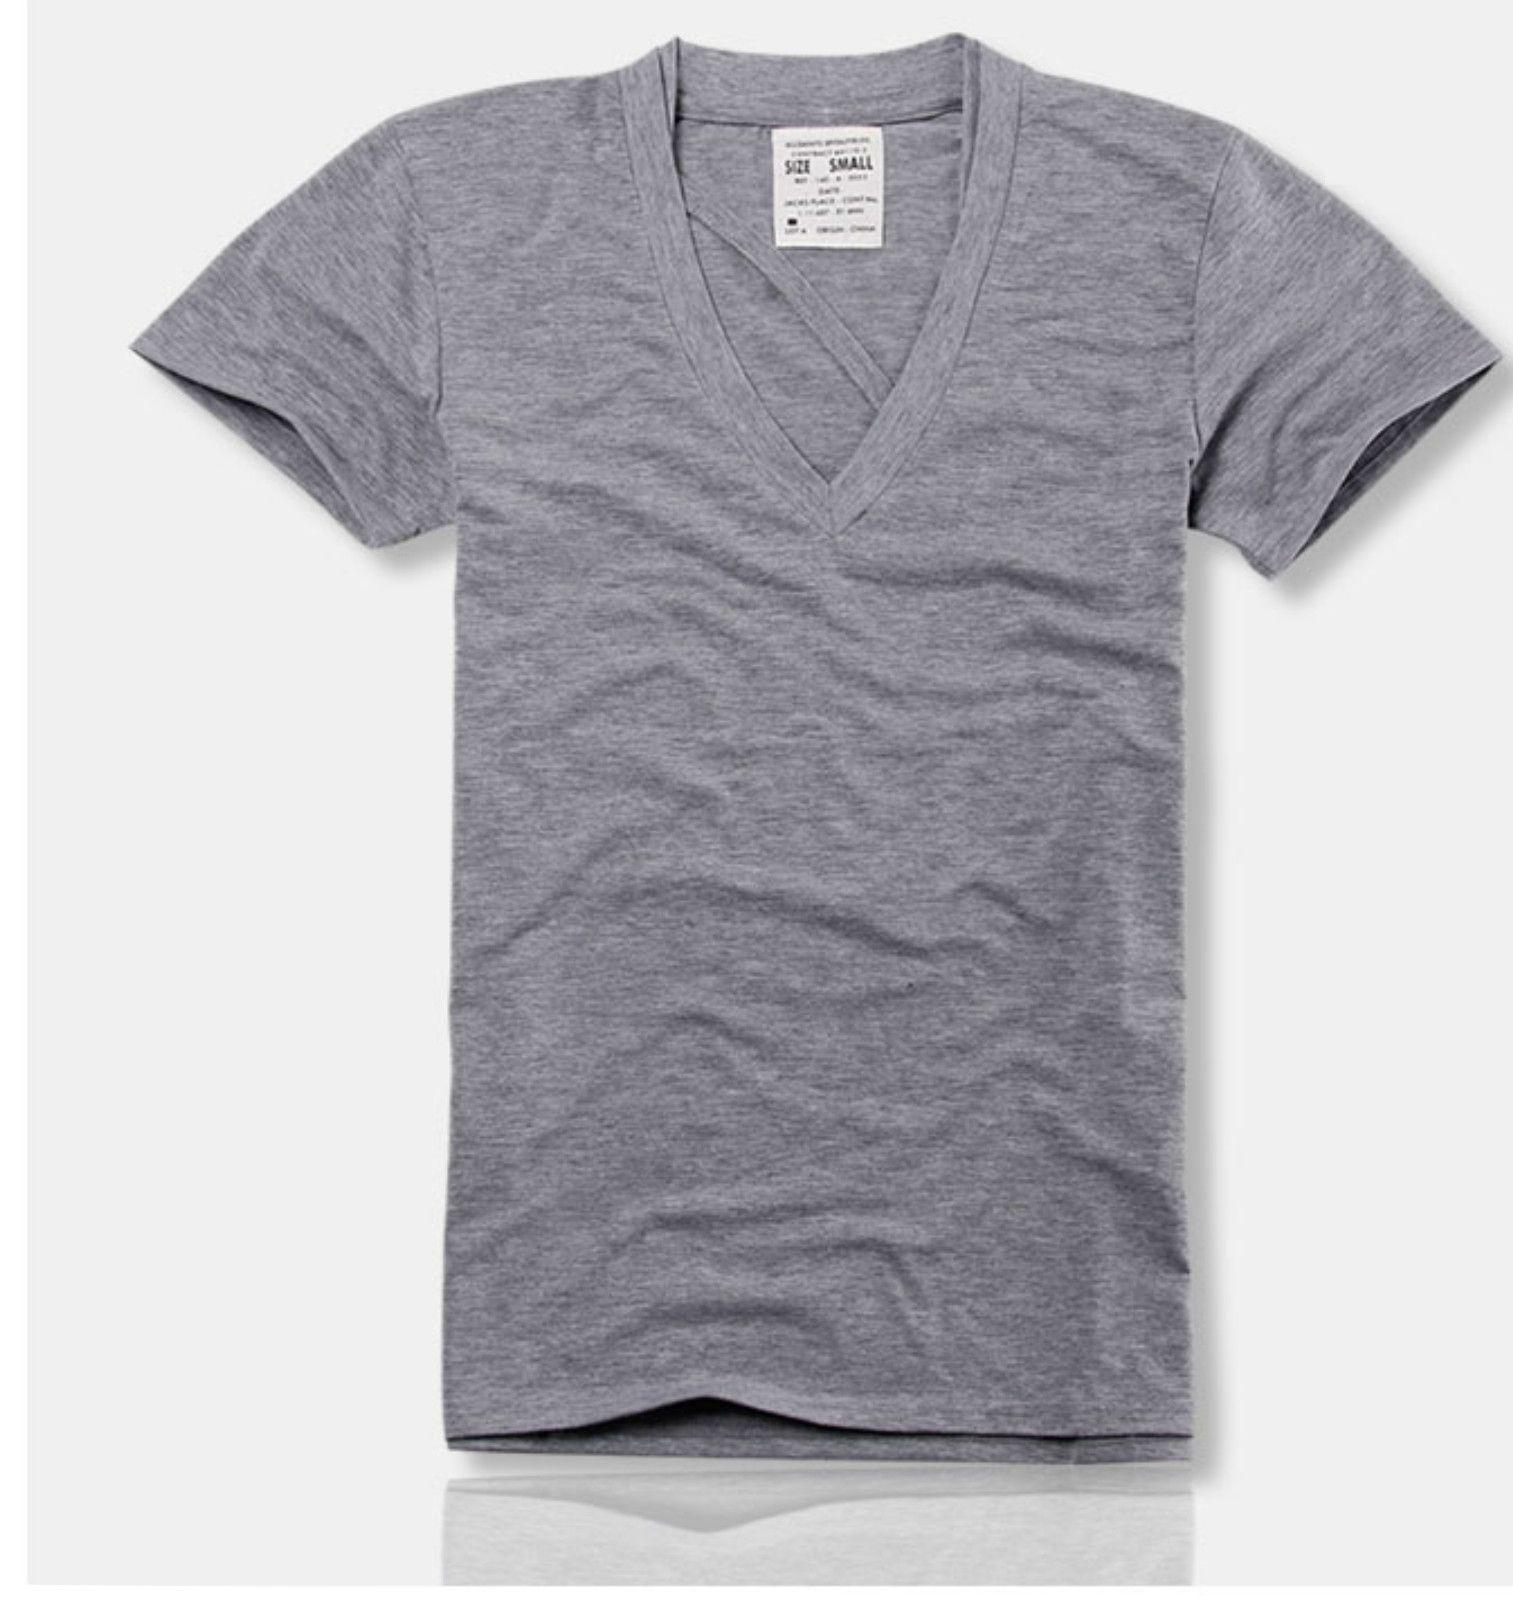 T shirt white ebay - All Saints Mens Cotton Lightweight V Neck T Shirt New L Ebay